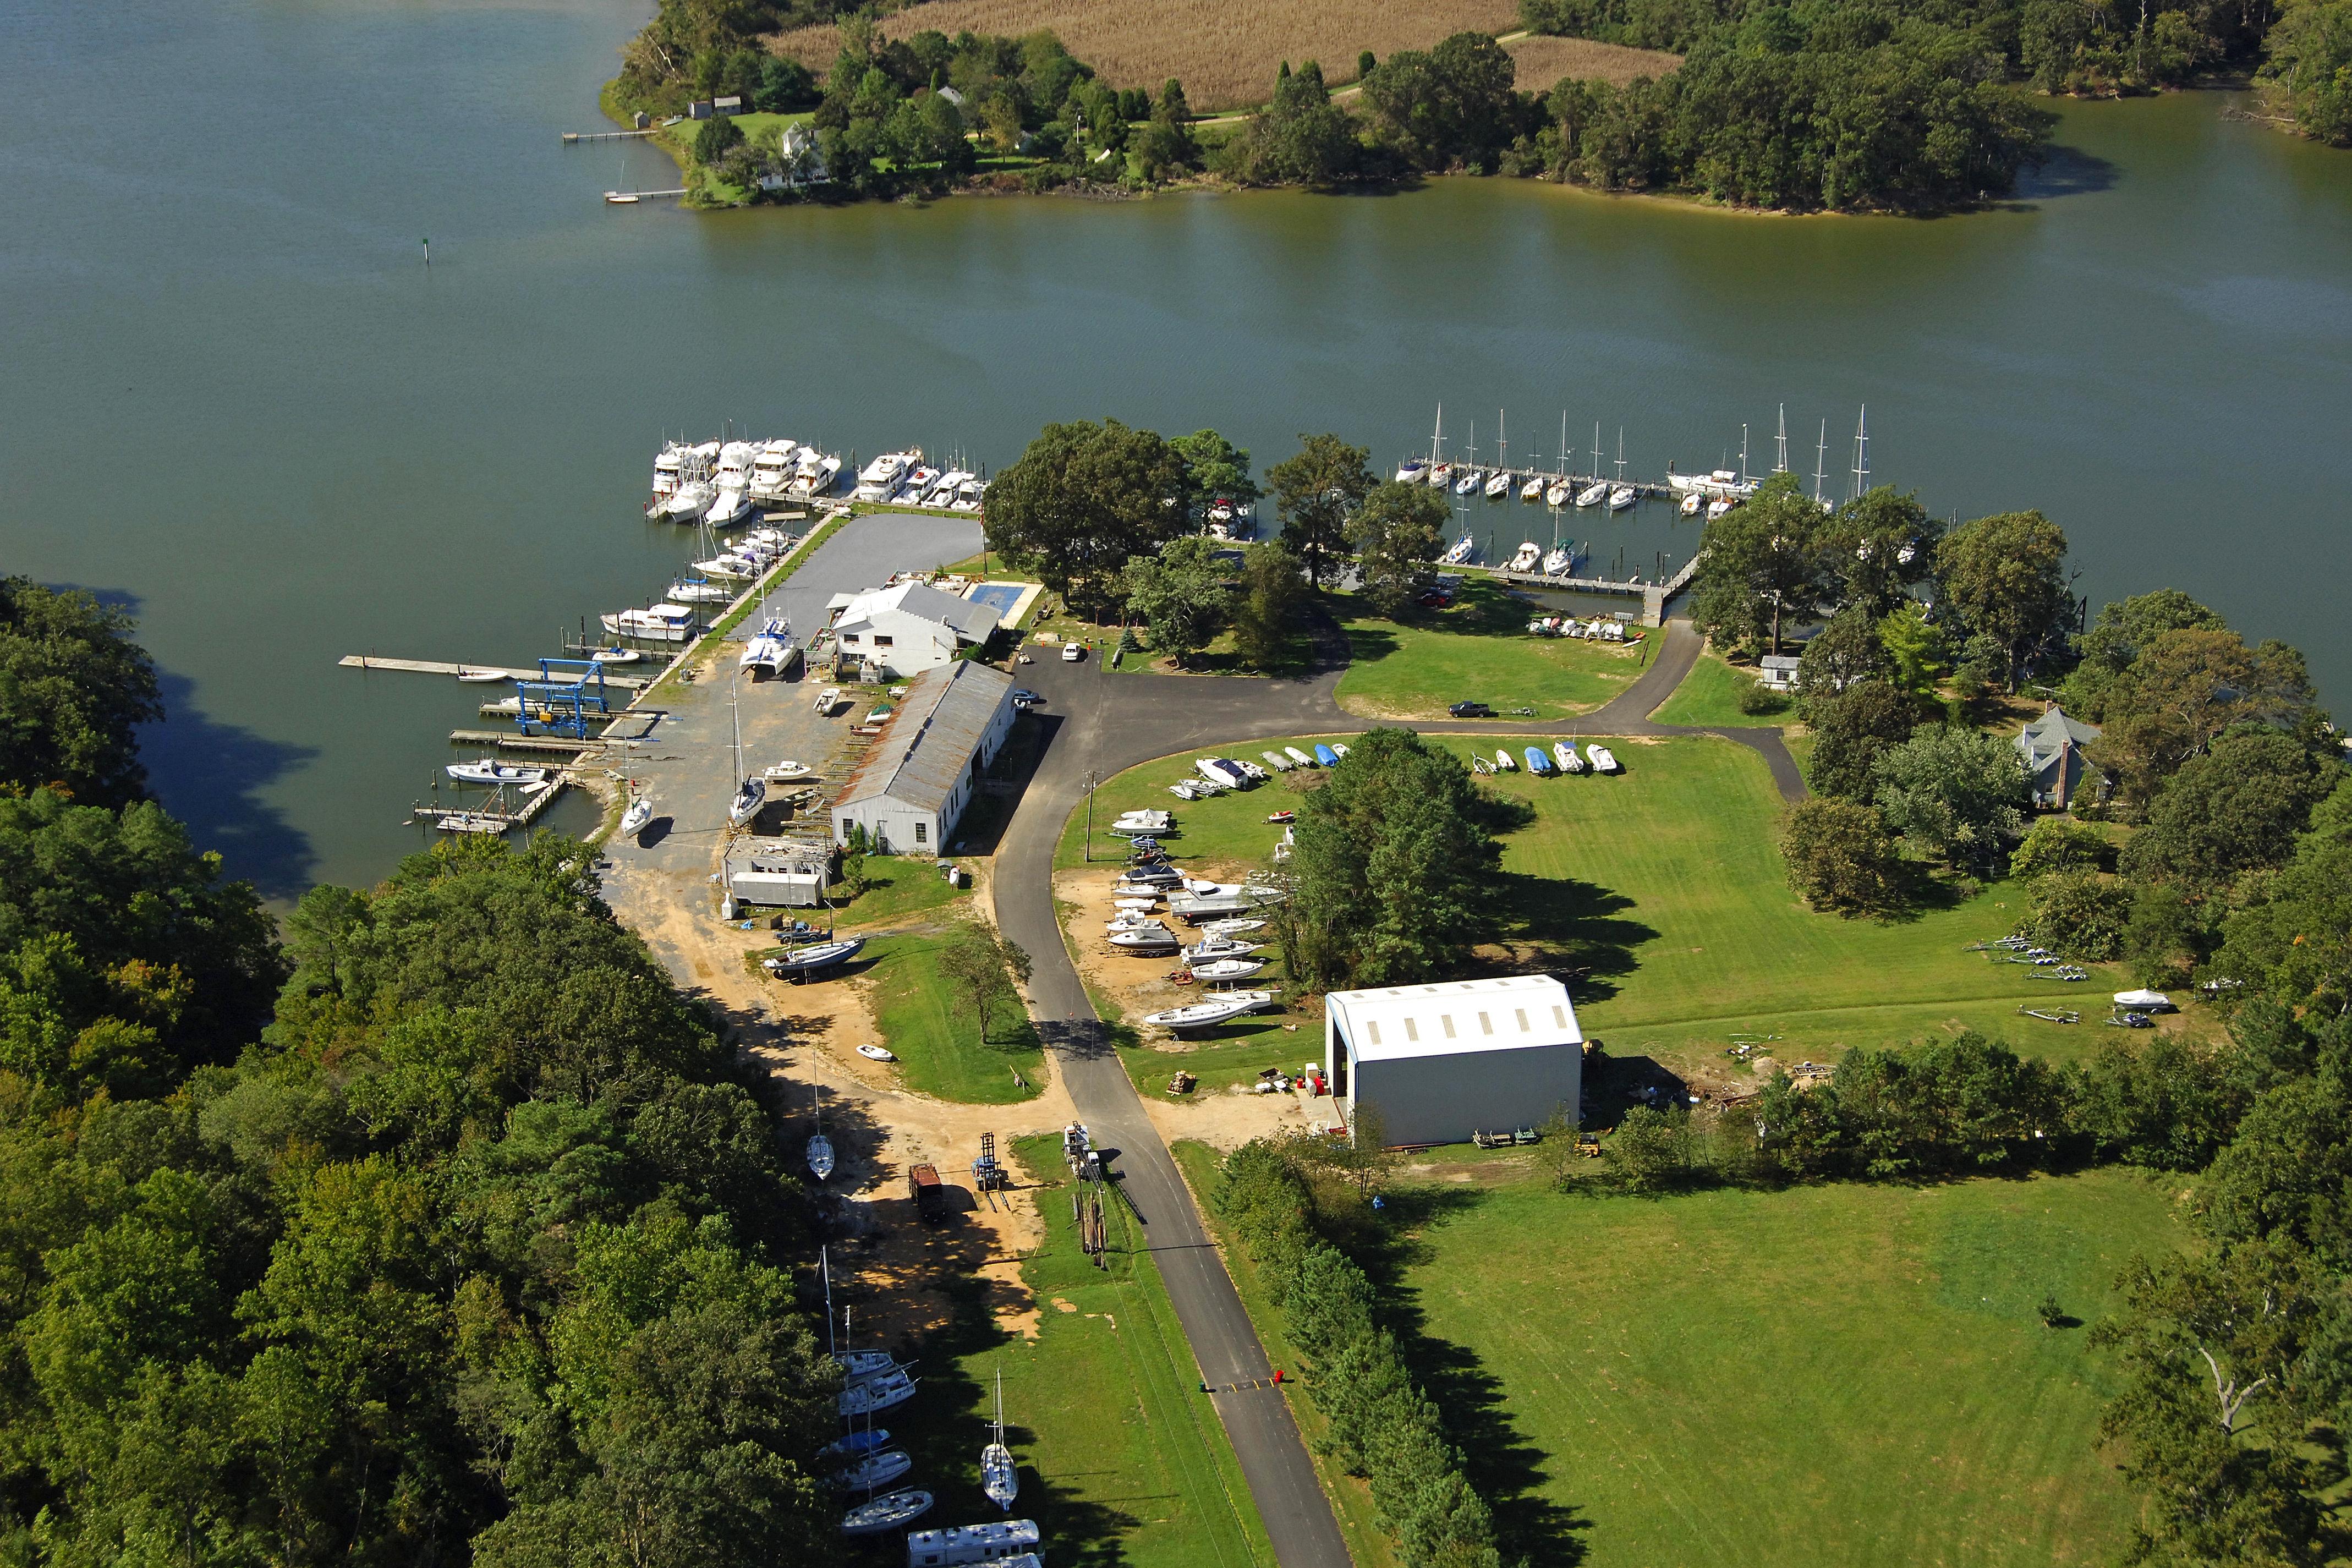 Dennis Point Marina & Campground (prev St Marys Marina) in